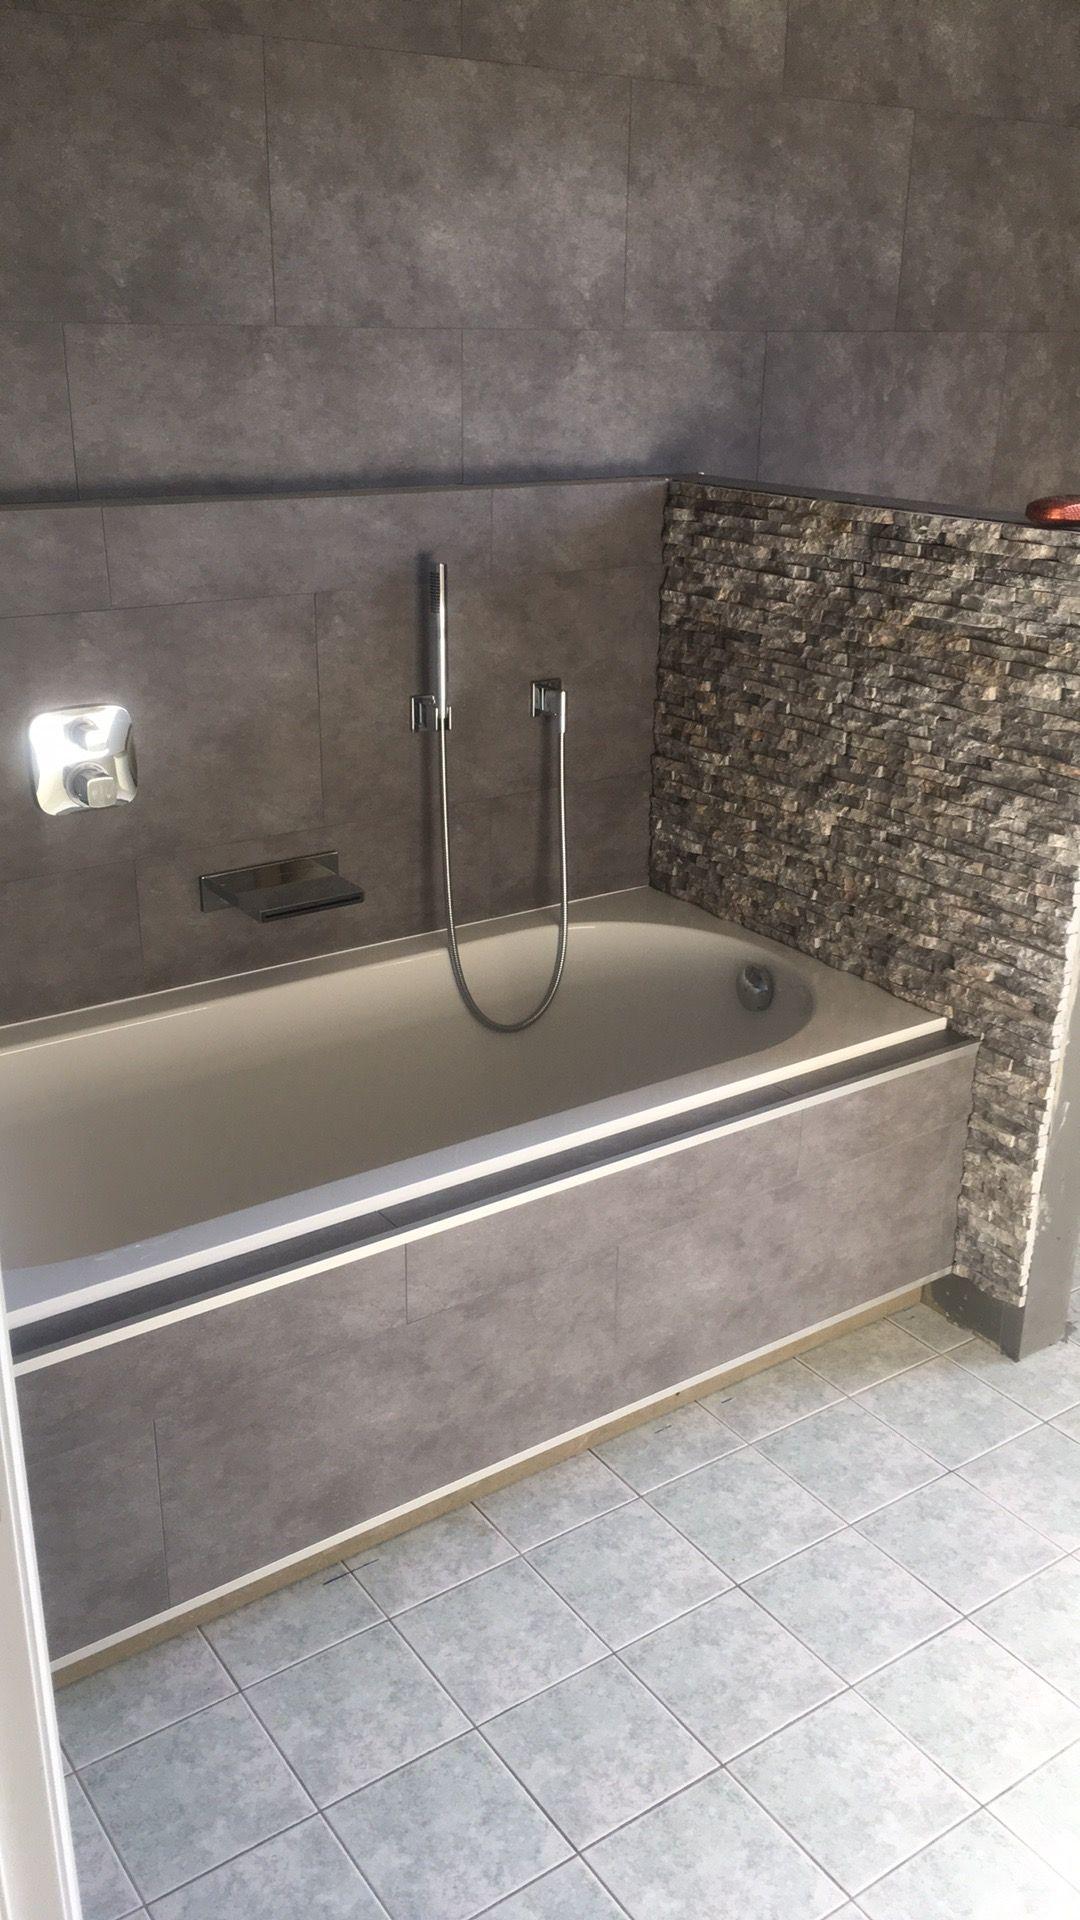 Renovatie badkamer#steenstrips#dornbracht | Badkamer | Pinterest